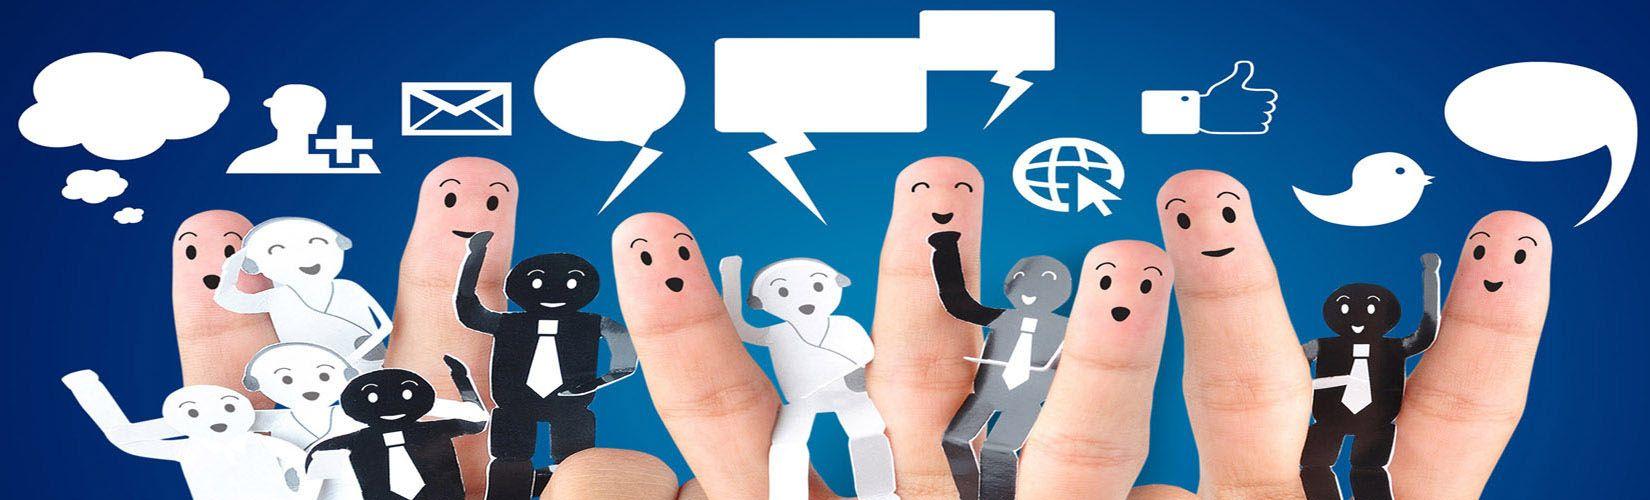 marketing services Search engine optimization